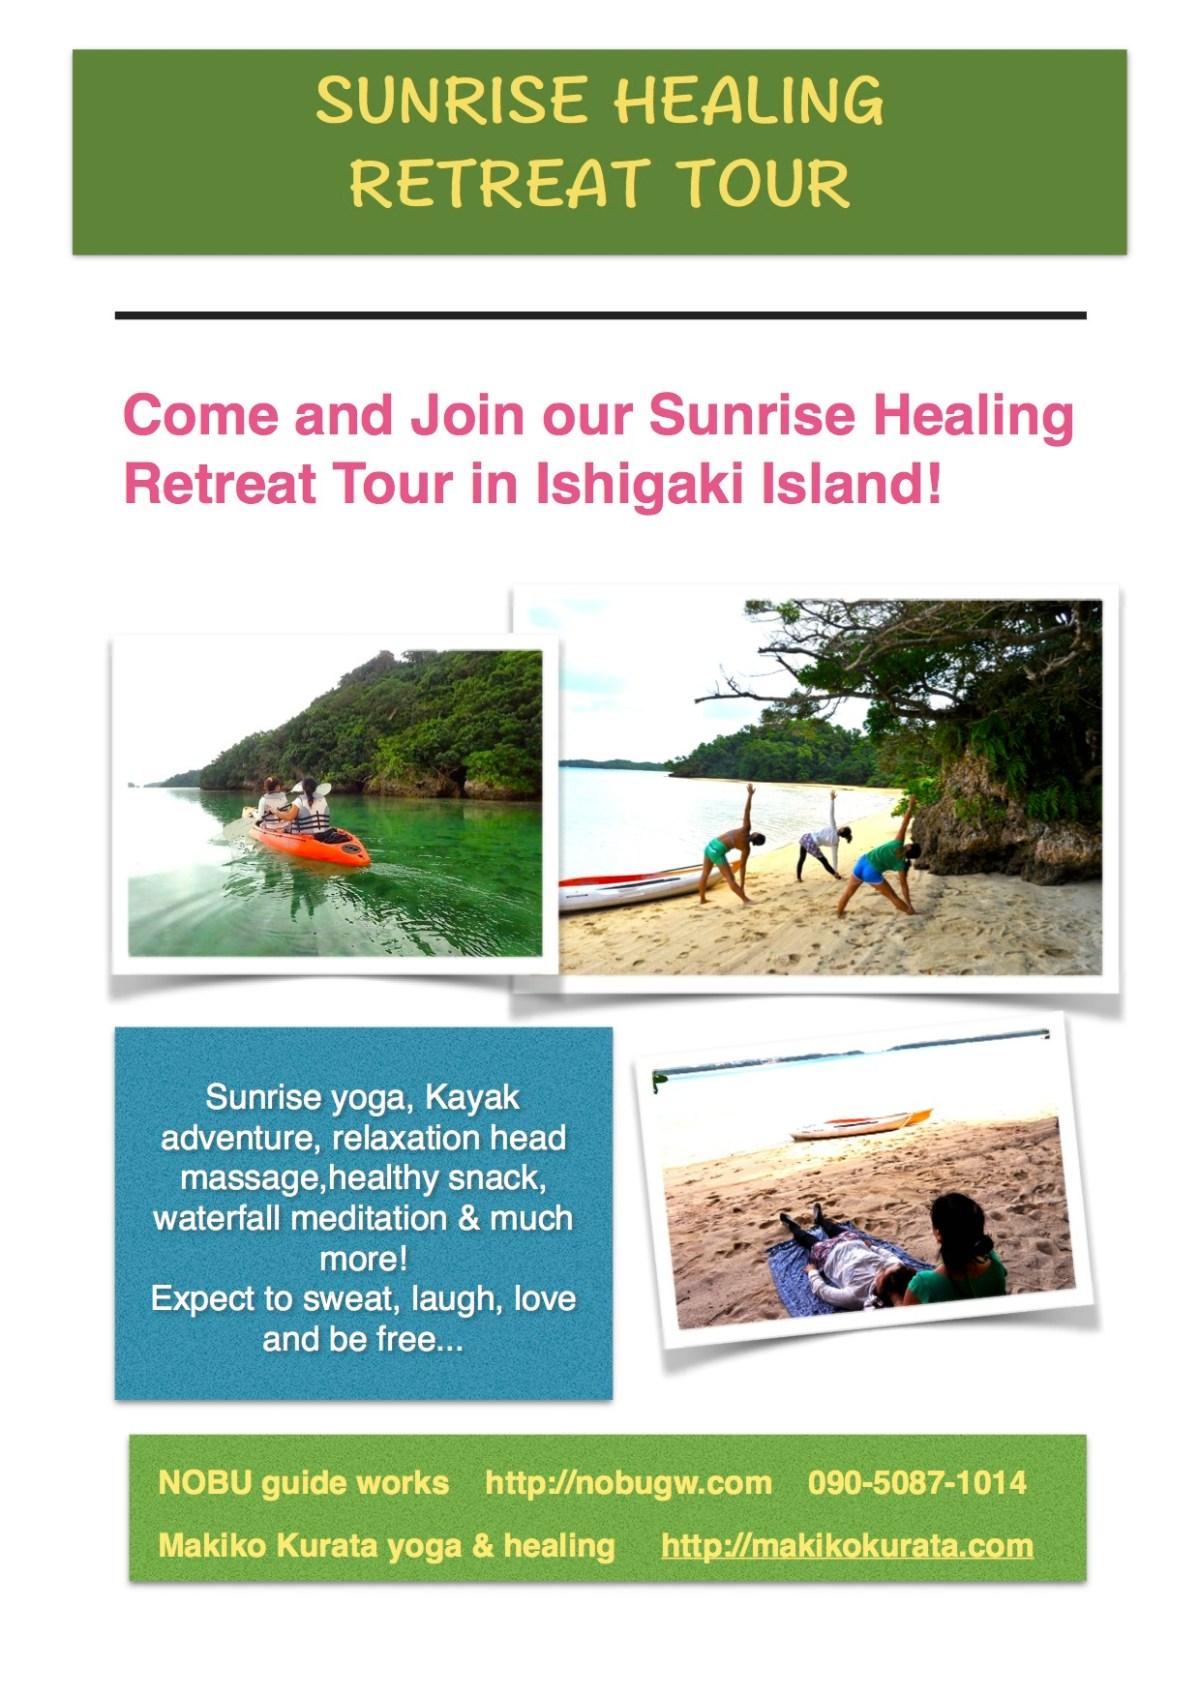 sunrise healing retreat